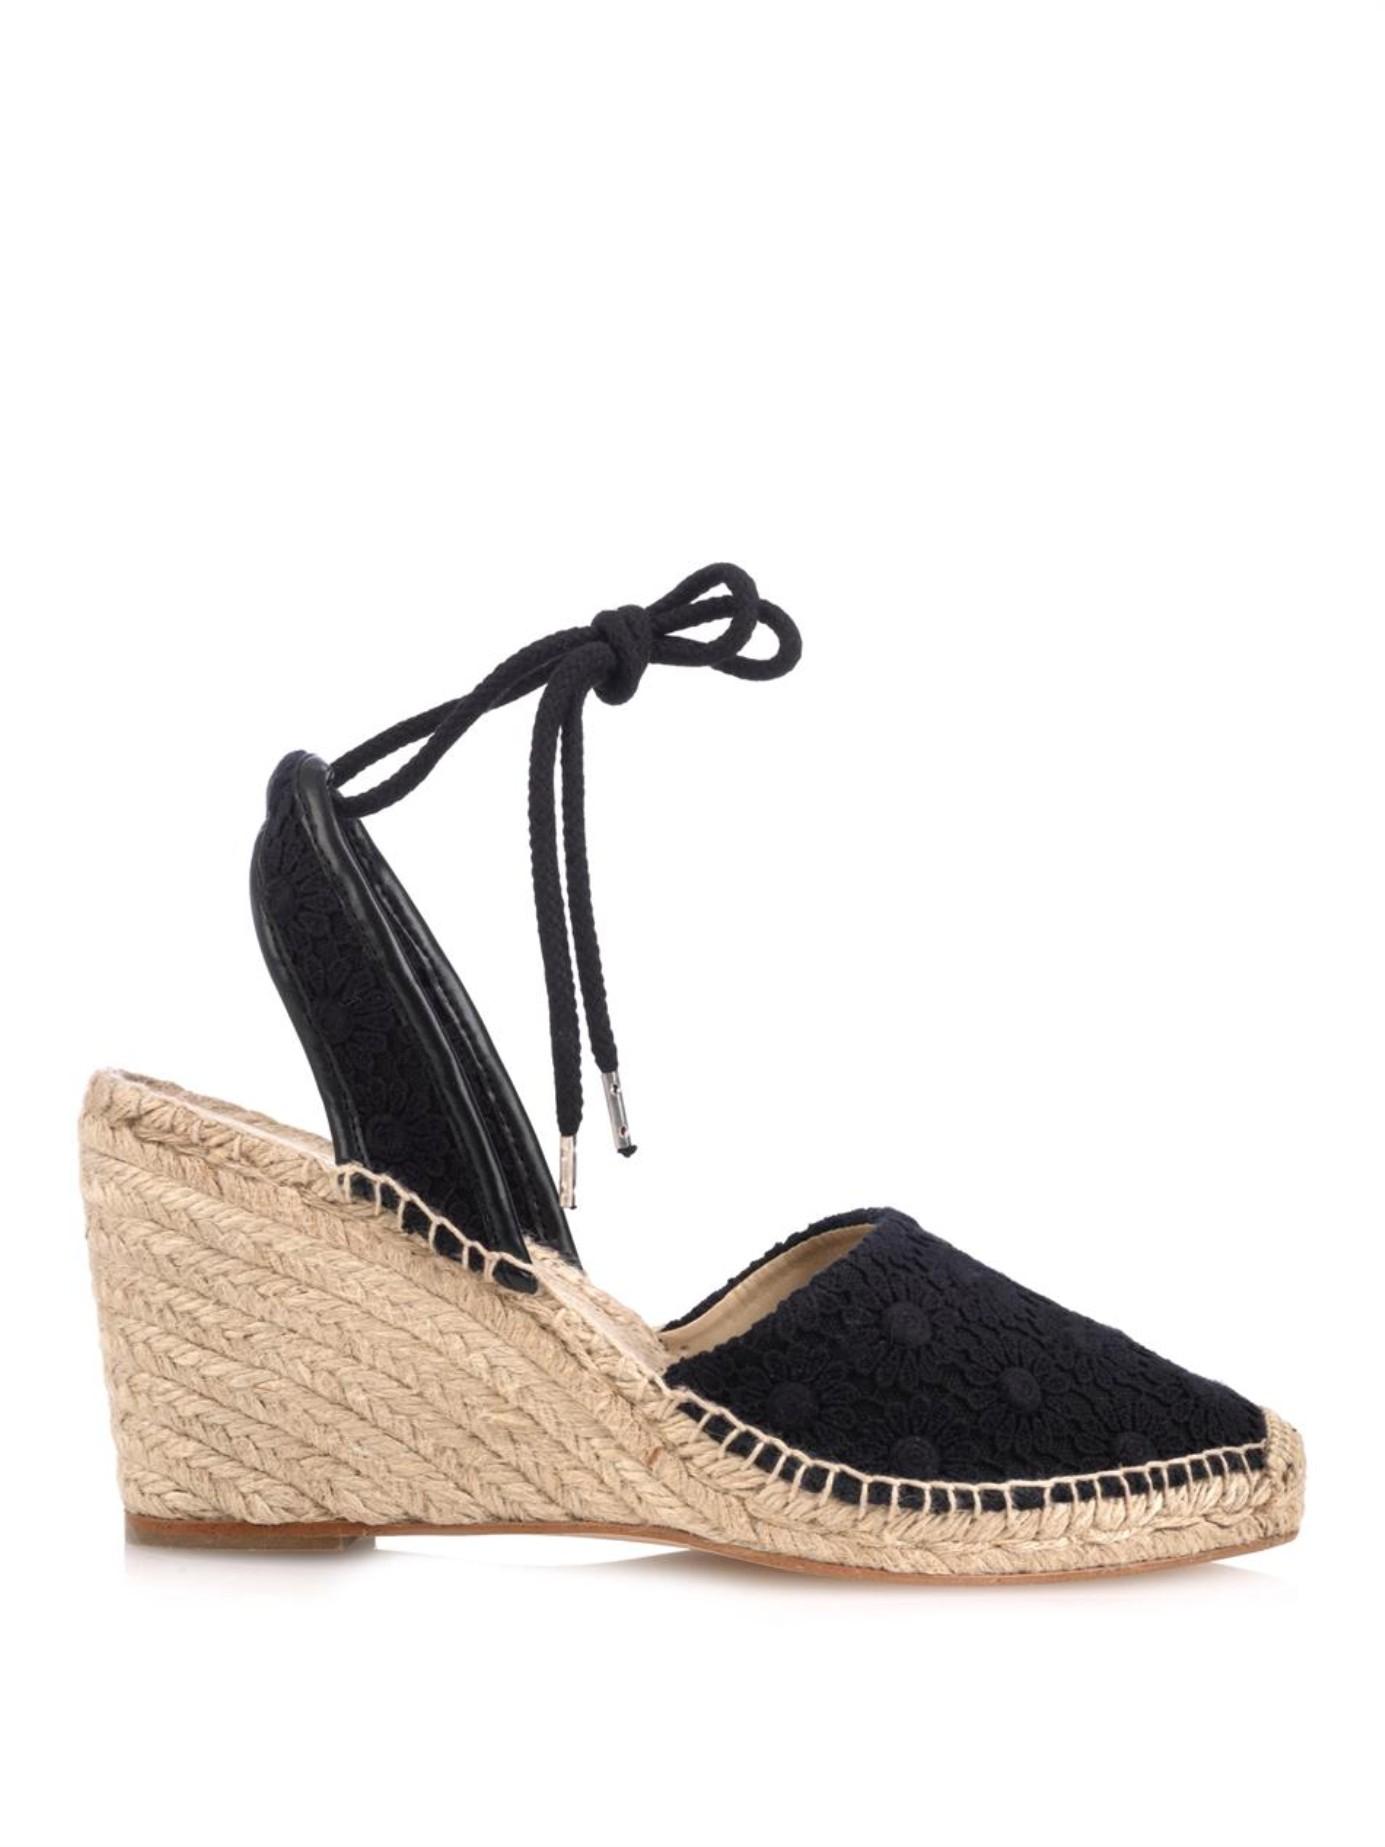 d281197db8a Lyst - Stella McCartney Emmeline Crochet-Knit Wedge Espadrilles in Black